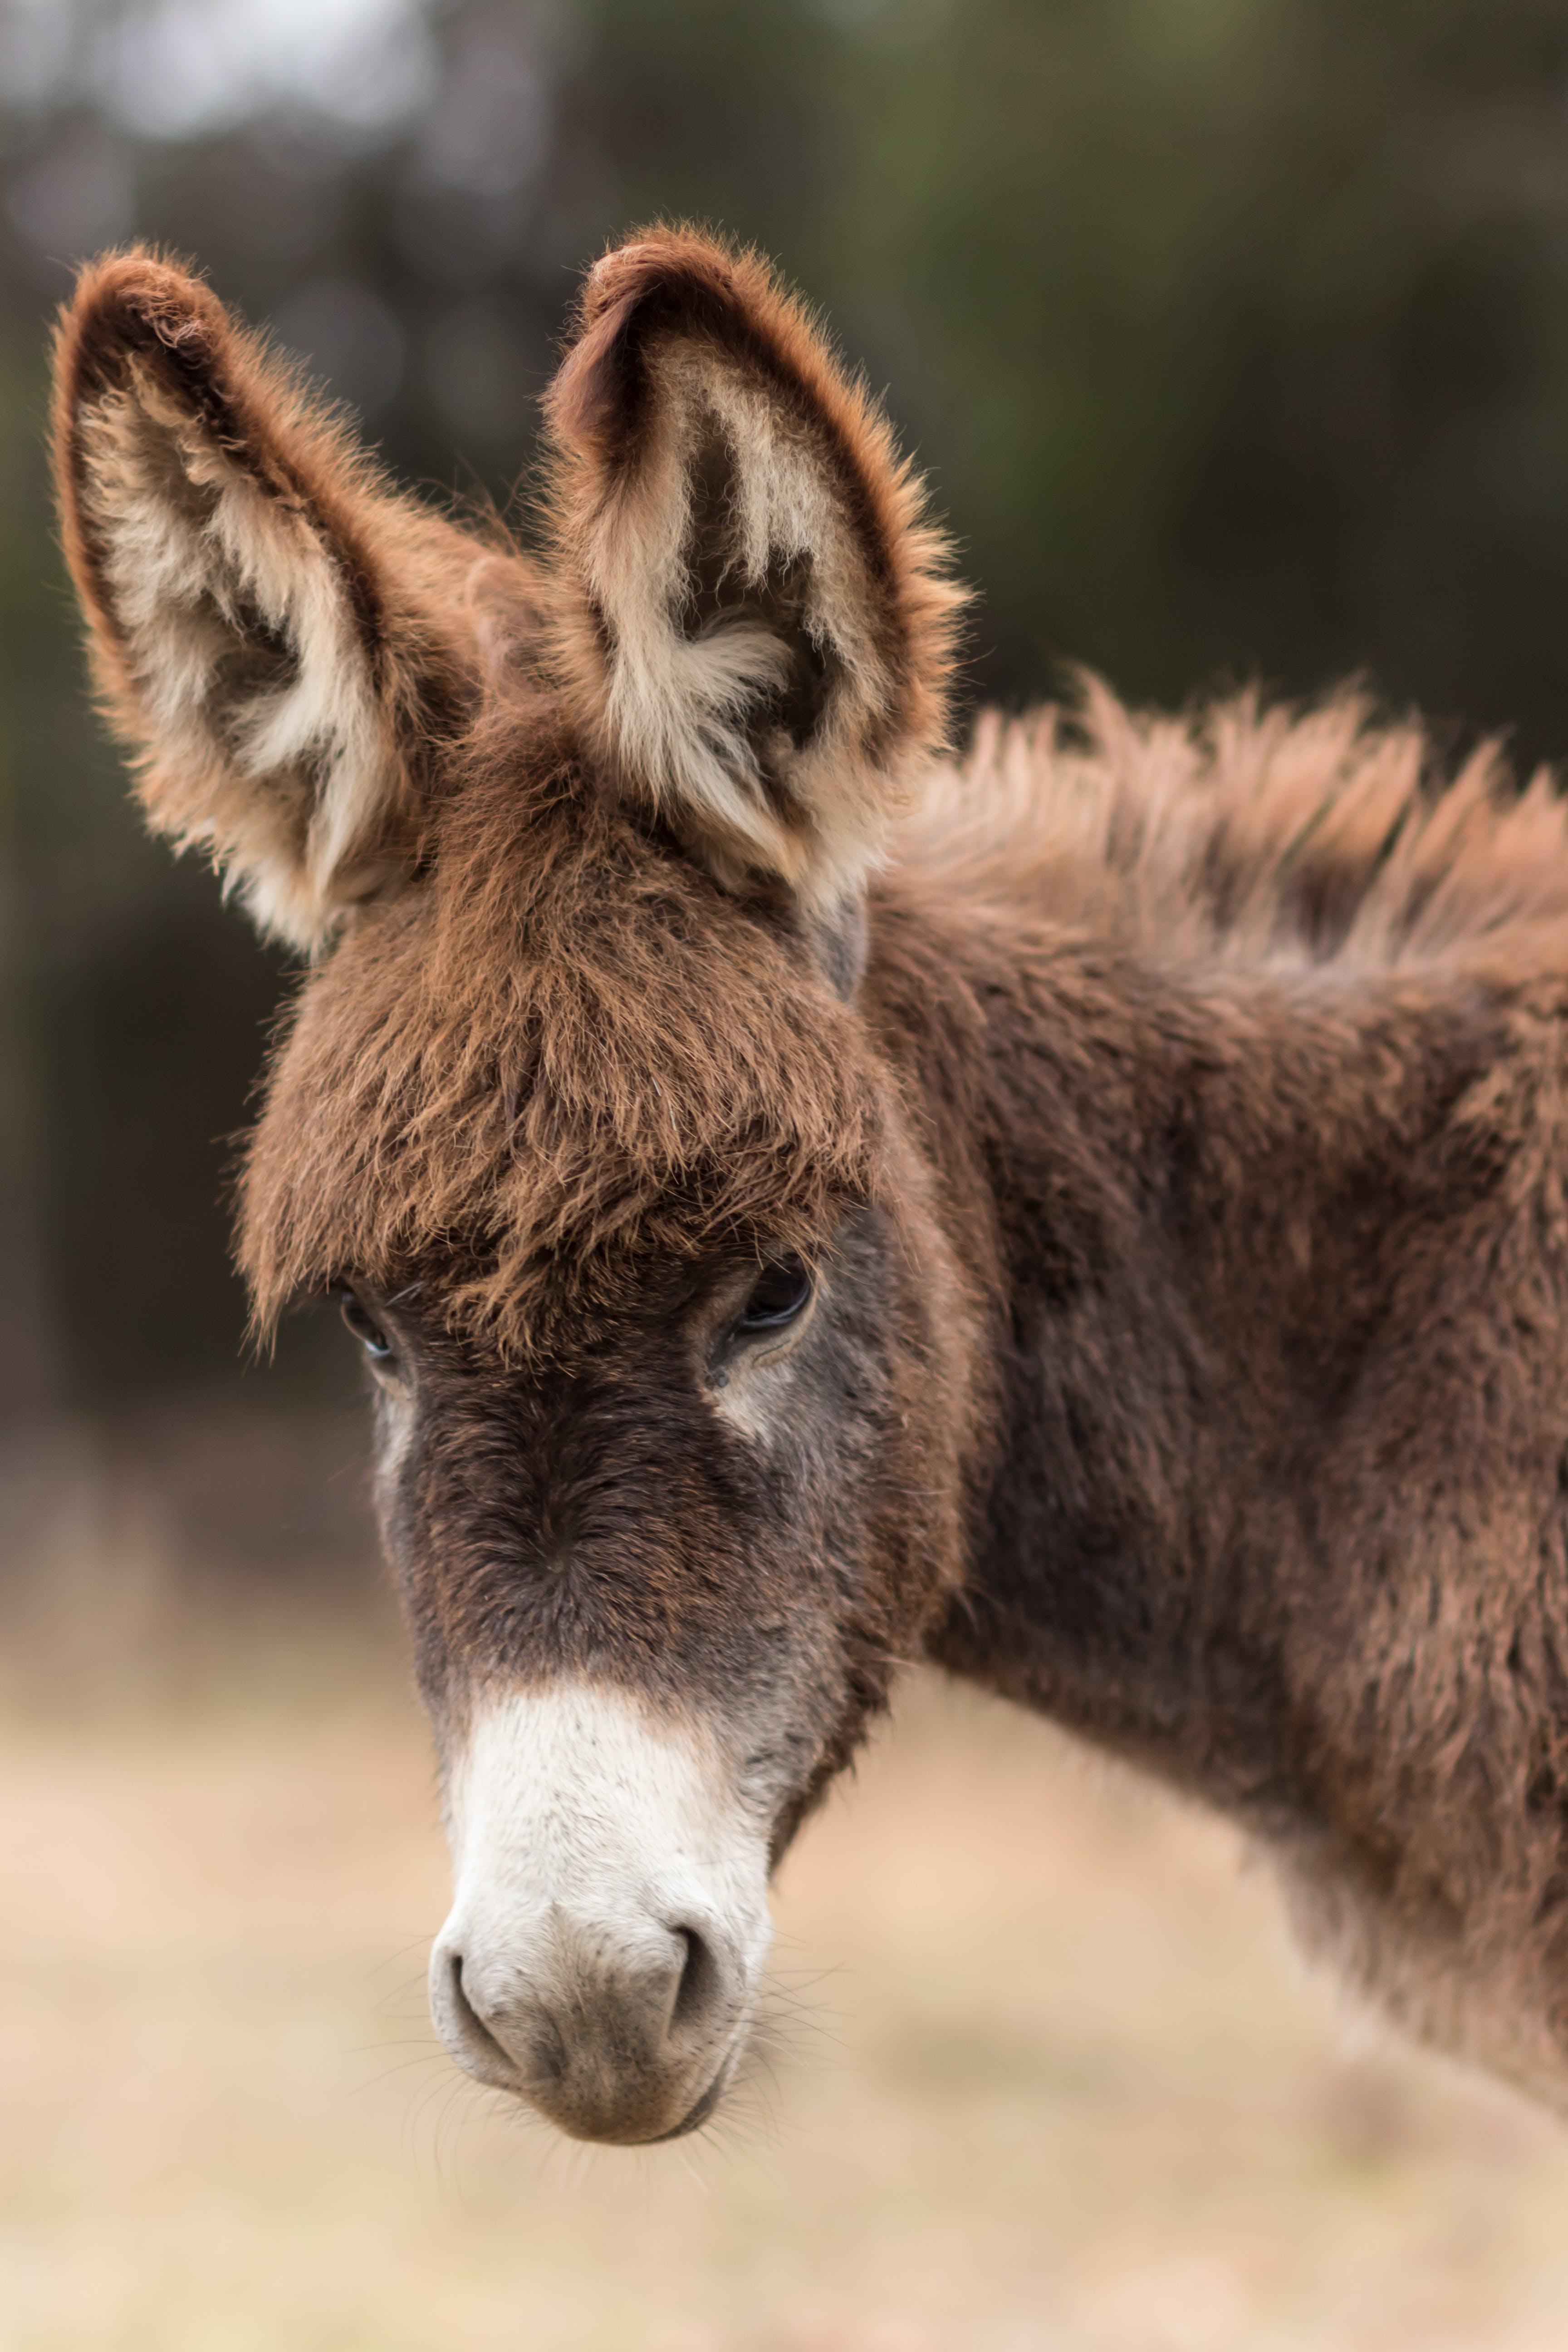 Foto d'estoc gratuïta de animal, animal de granja, burro, buscant